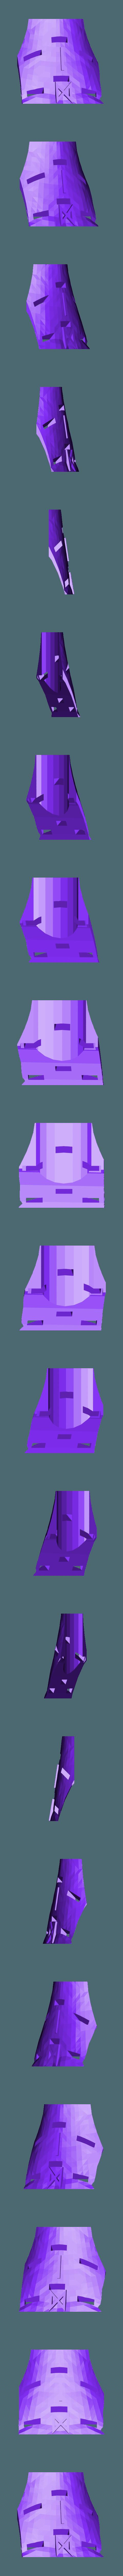 GADGETS back  pt2 .stl Download free STL file GADGET the robotic Gremlin • 3D printing object, atarka3